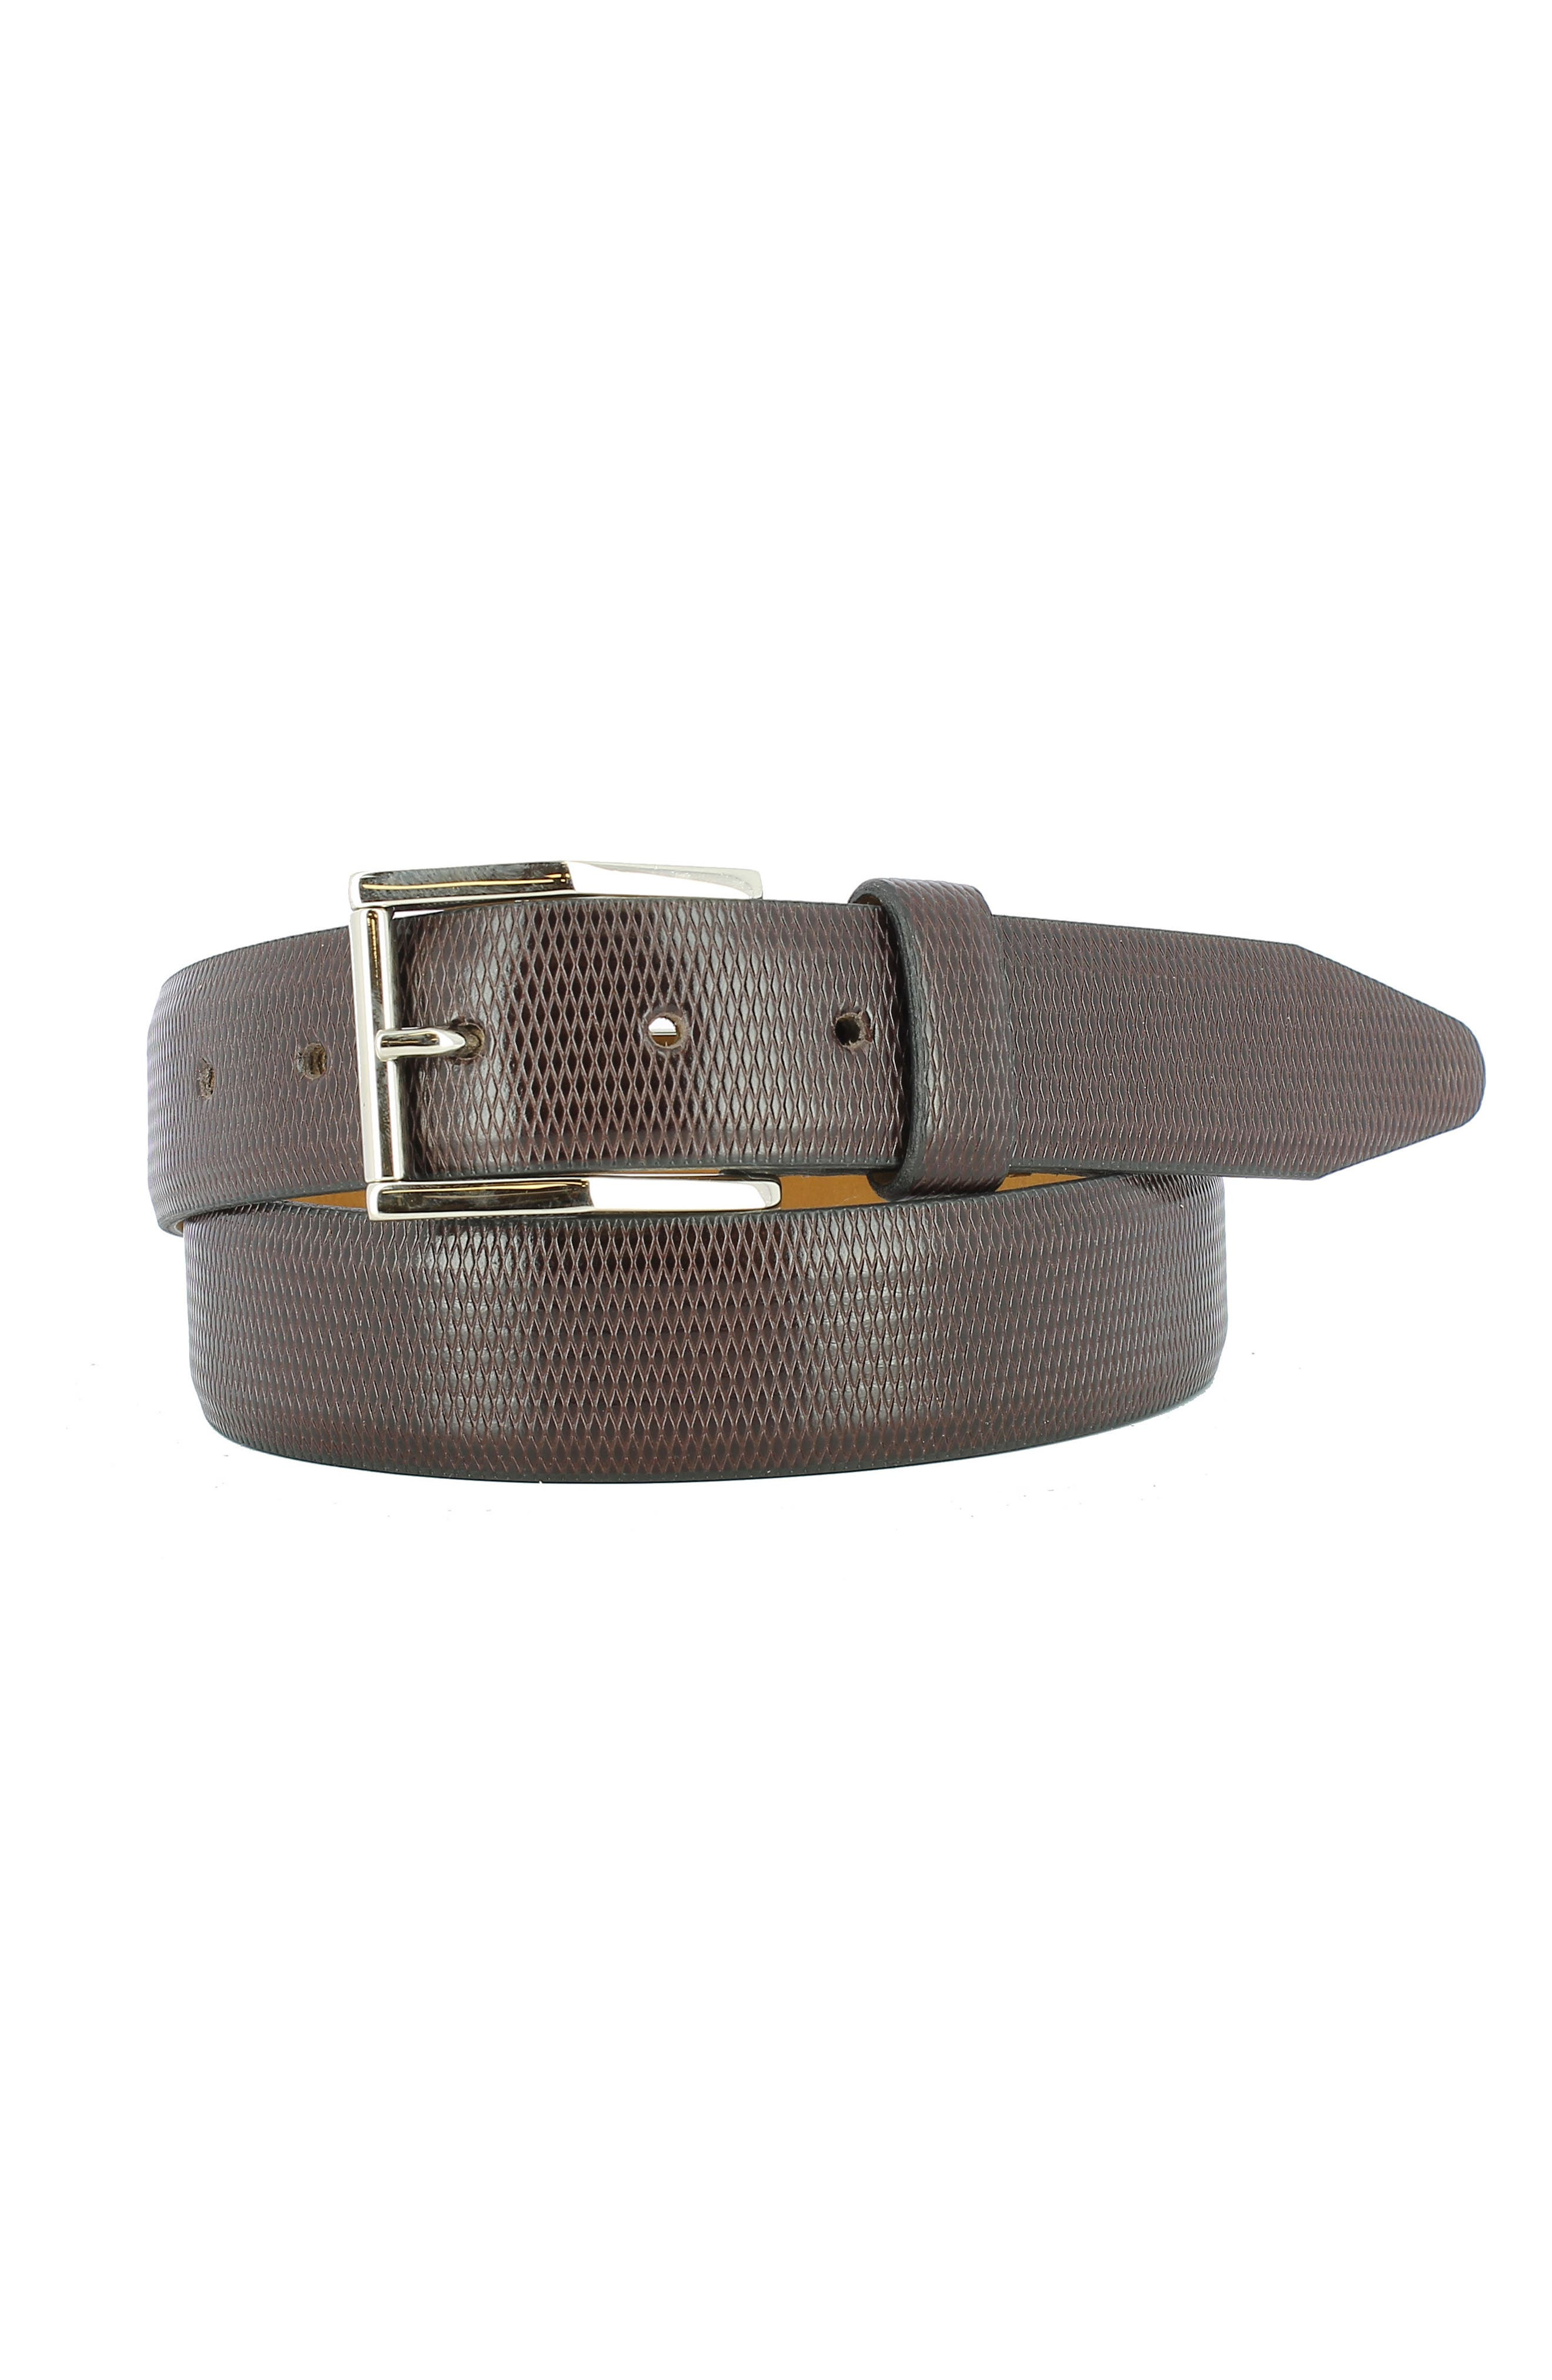 Remo Tulliani Gio Leather Belt